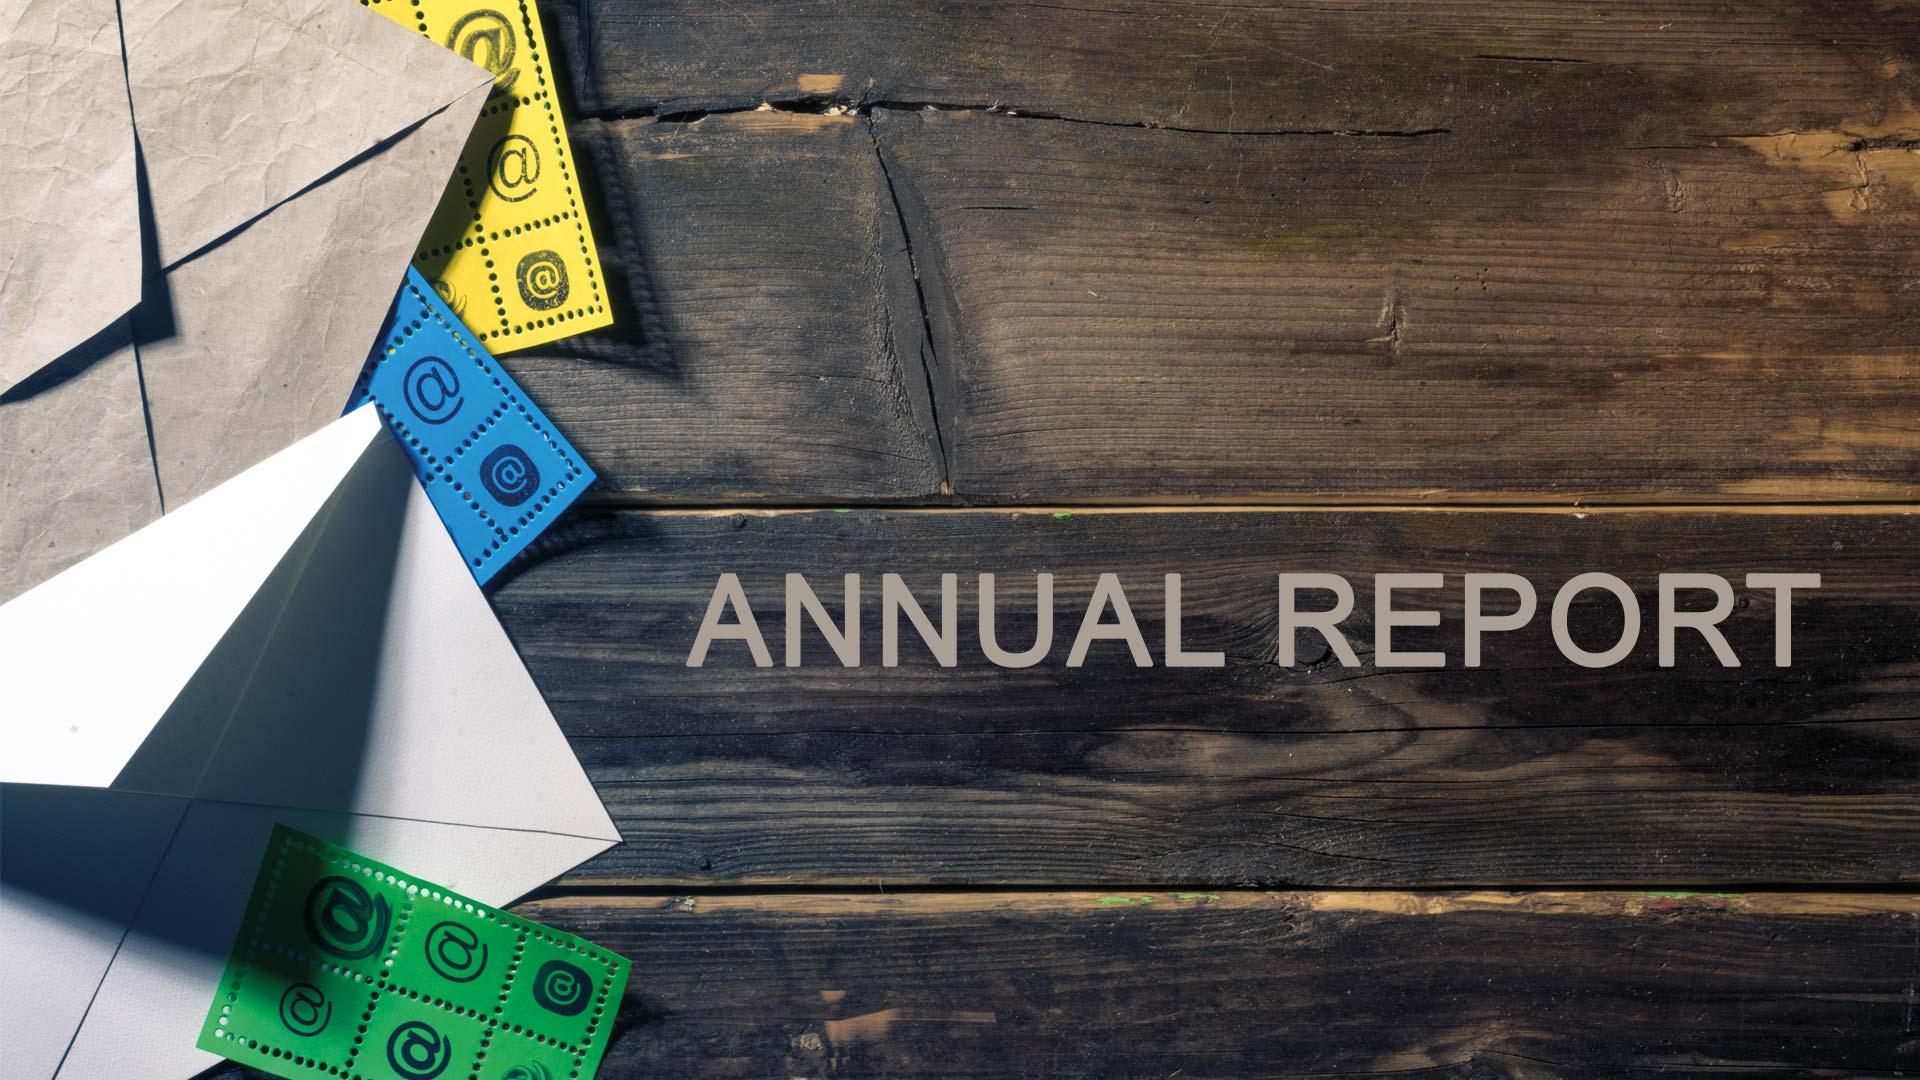 Annual Report Tearfund Germany Charitable Organization